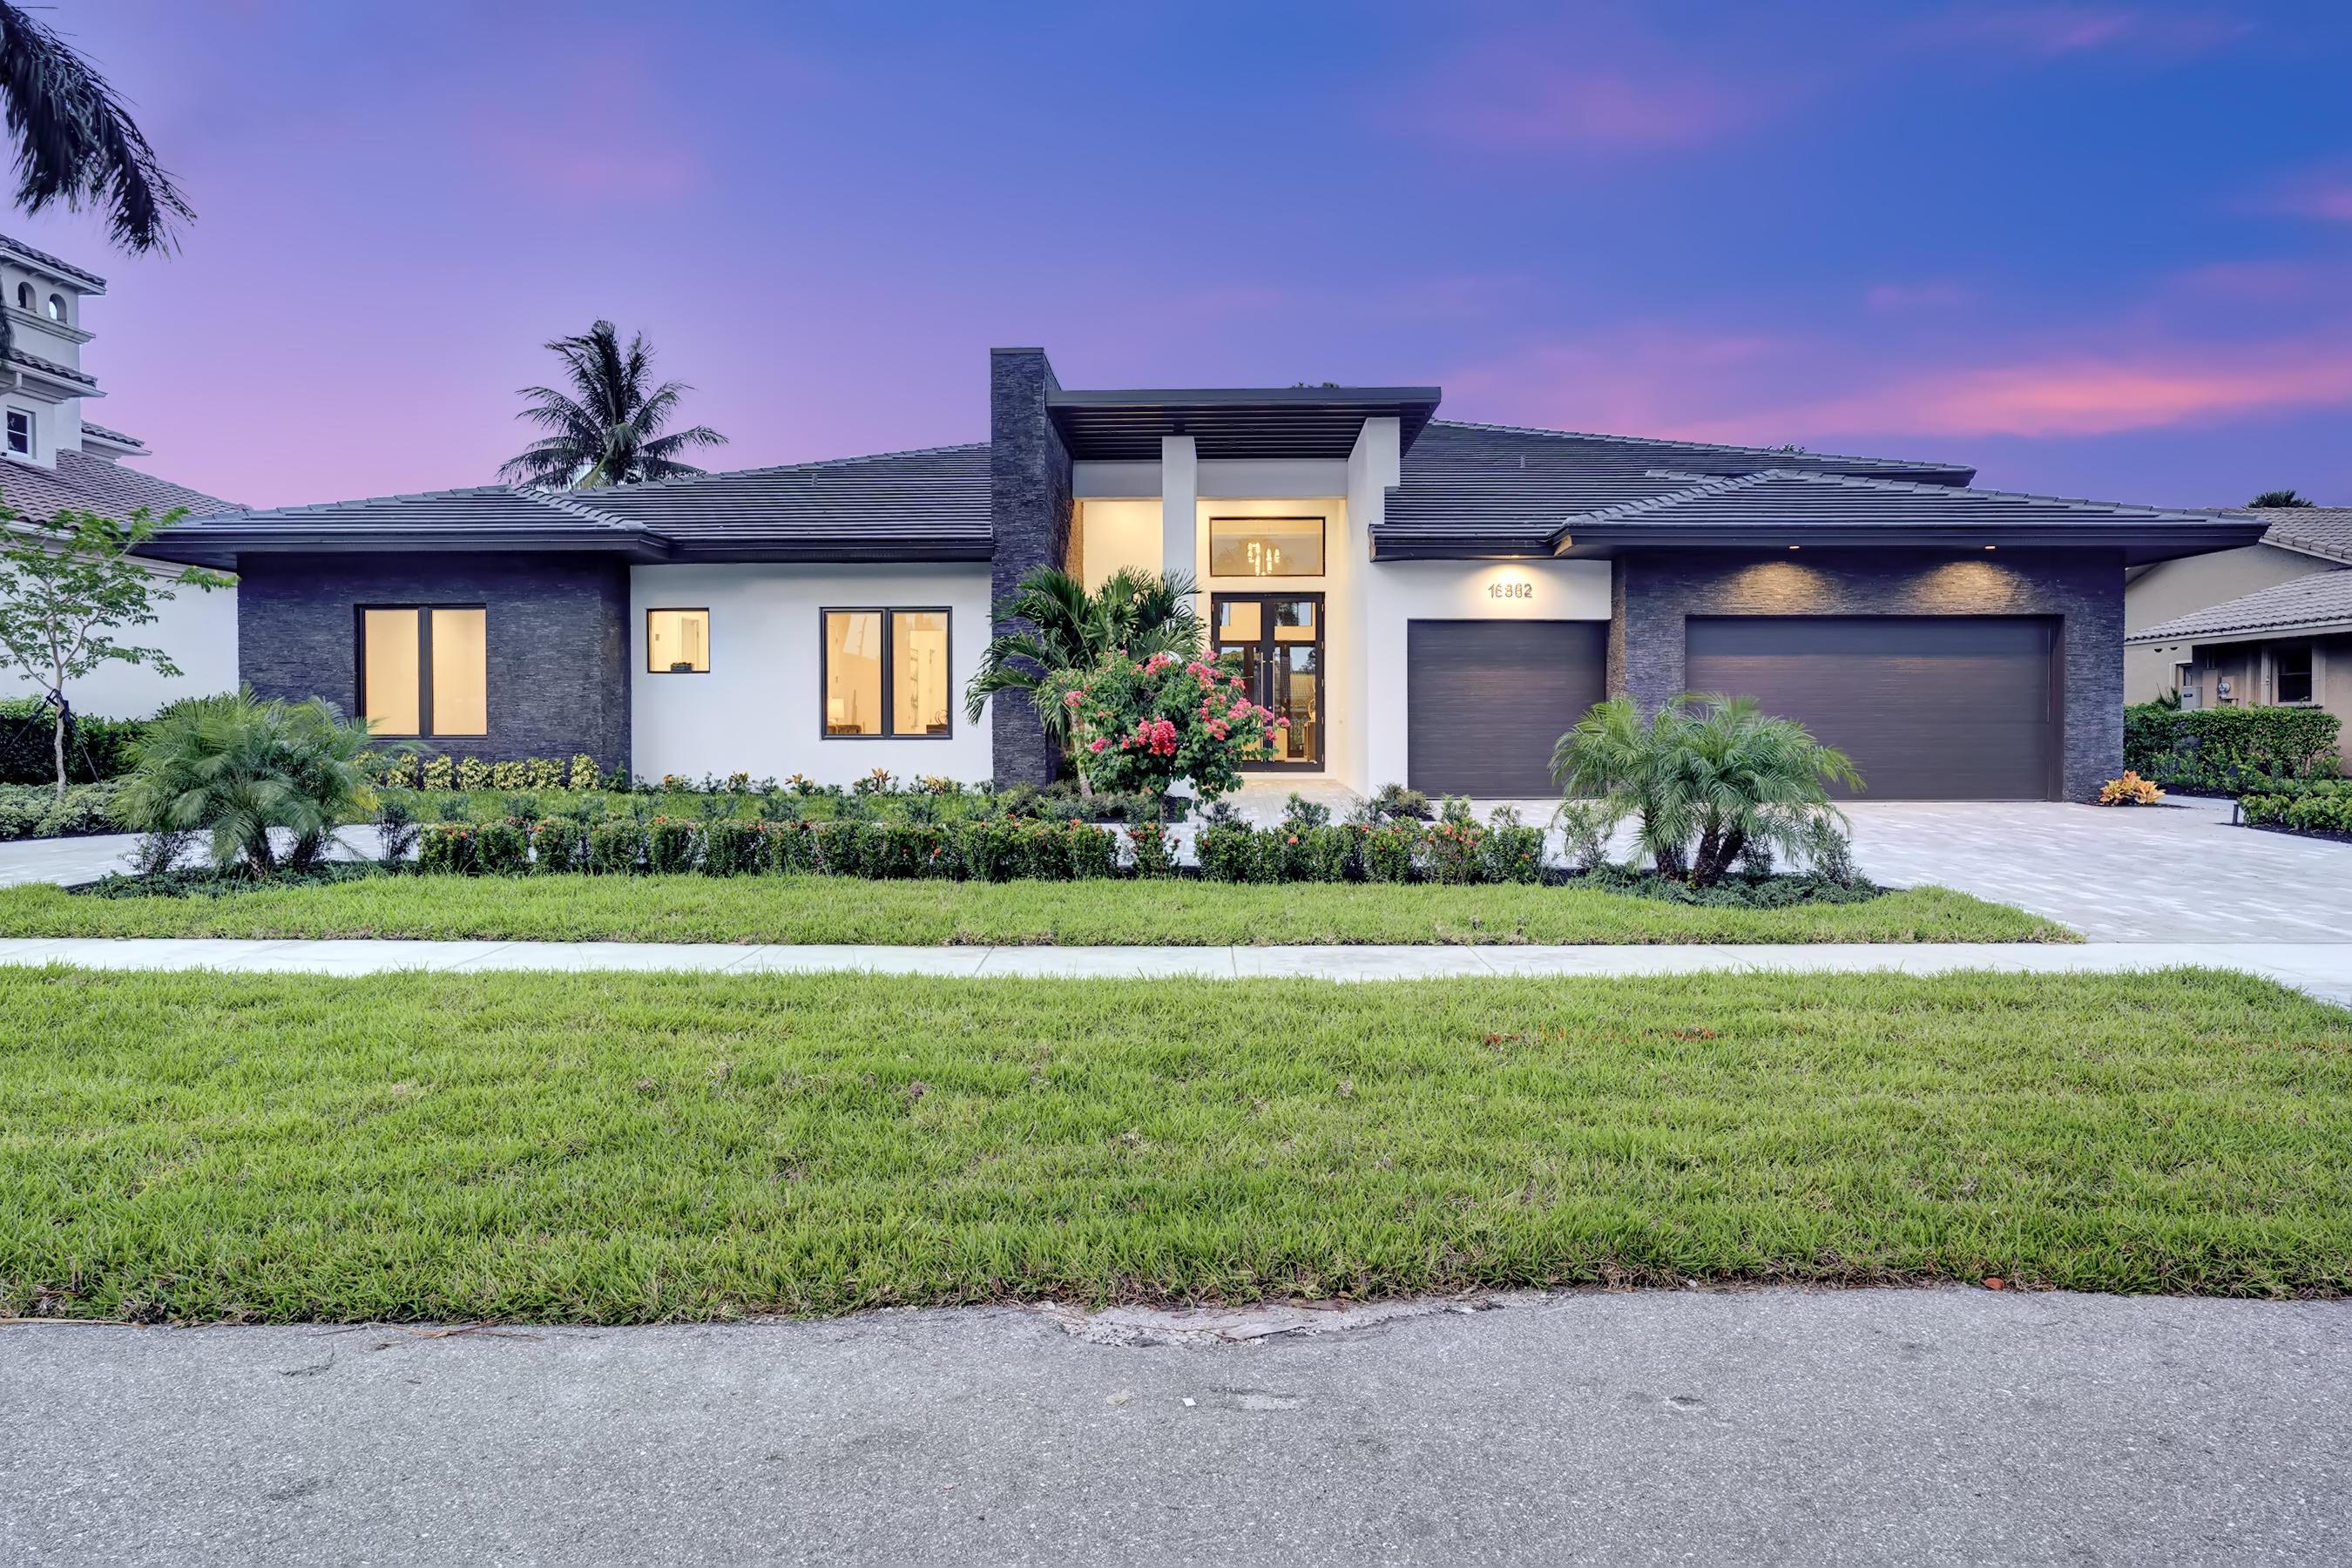 Photo of 16862 Rose Apple Drive, Delray Beach, FL 33445